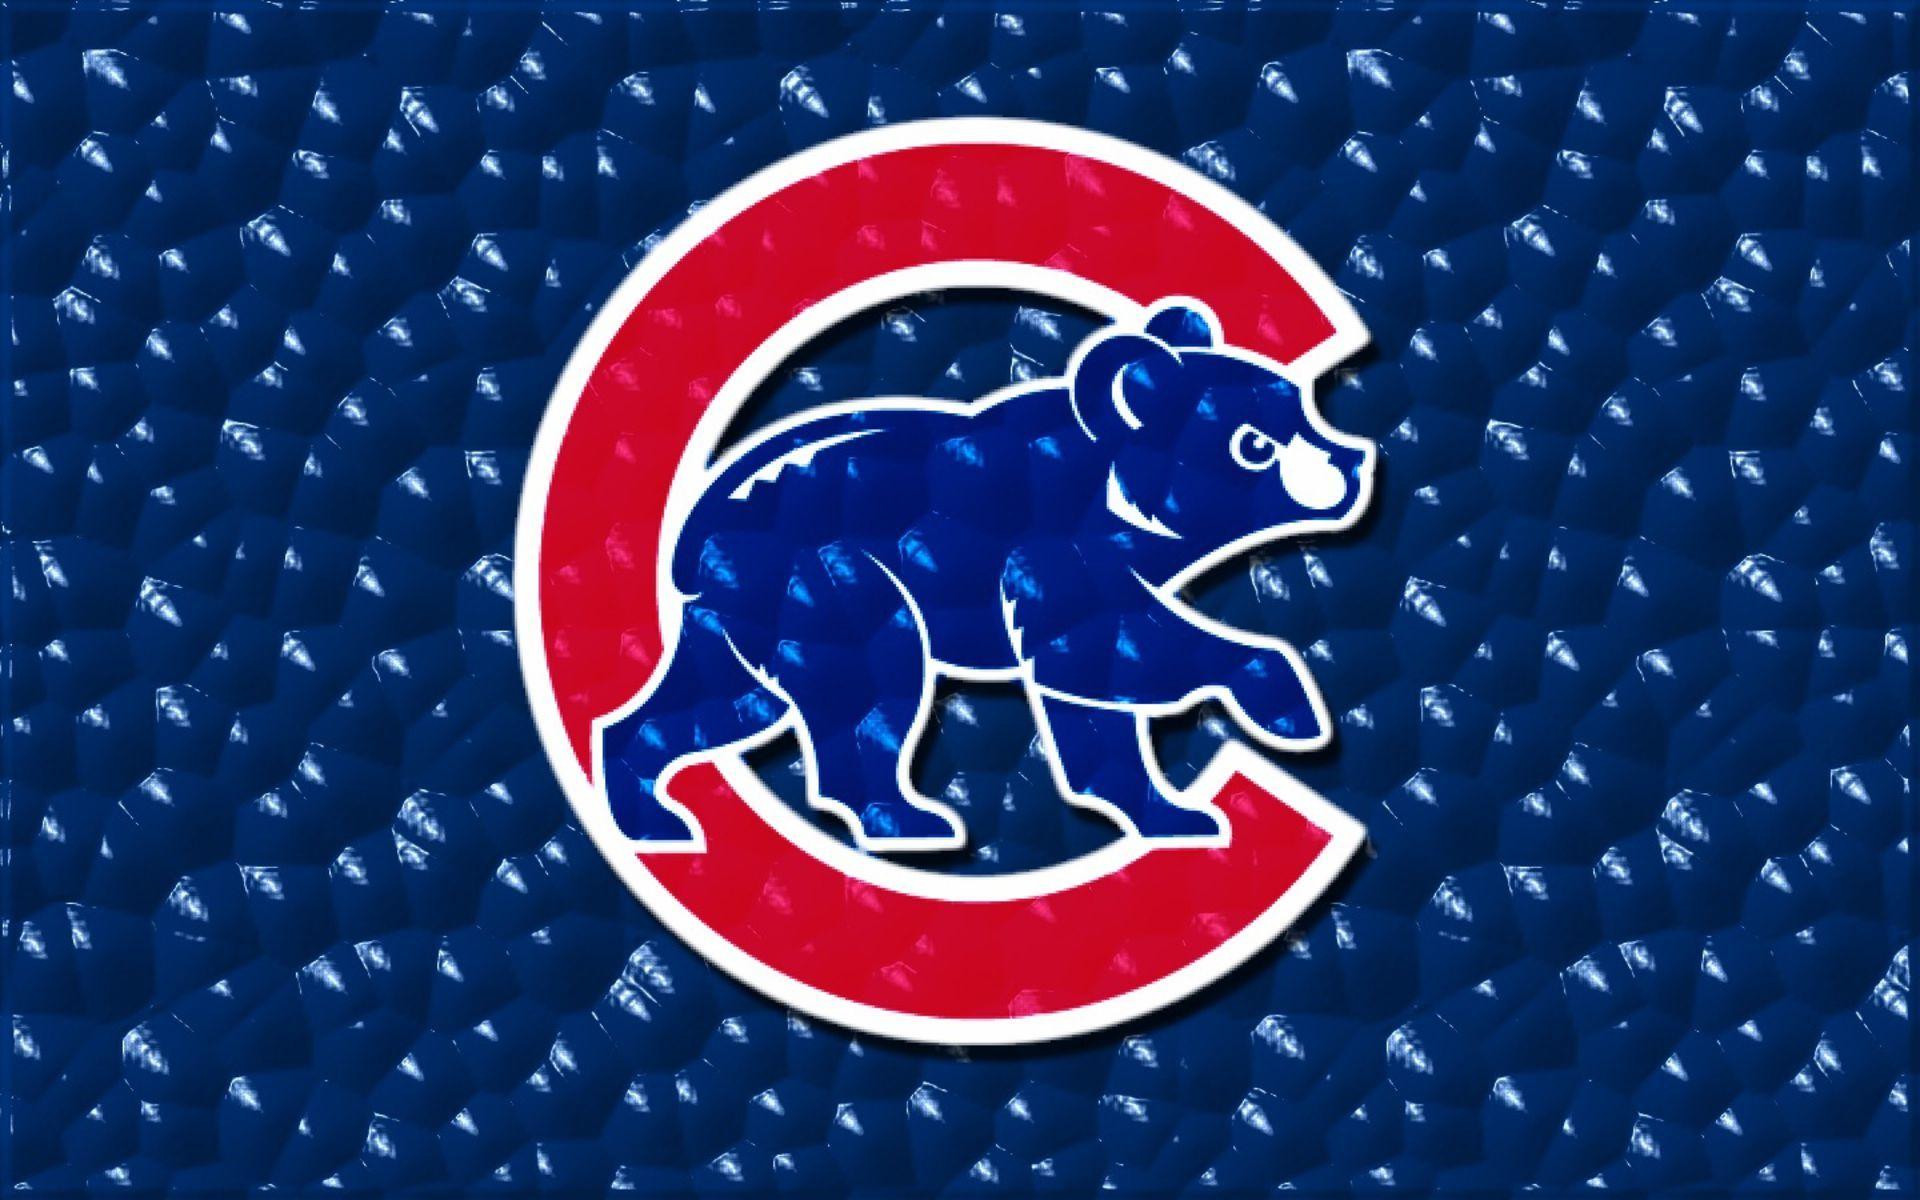 Cubs Computer Wallpapers Desktop Backgrounds 1920x1200 Id 474604 Chicago Cubs Wallpaper Cubs Wallpaper Chicago Cubs Logo